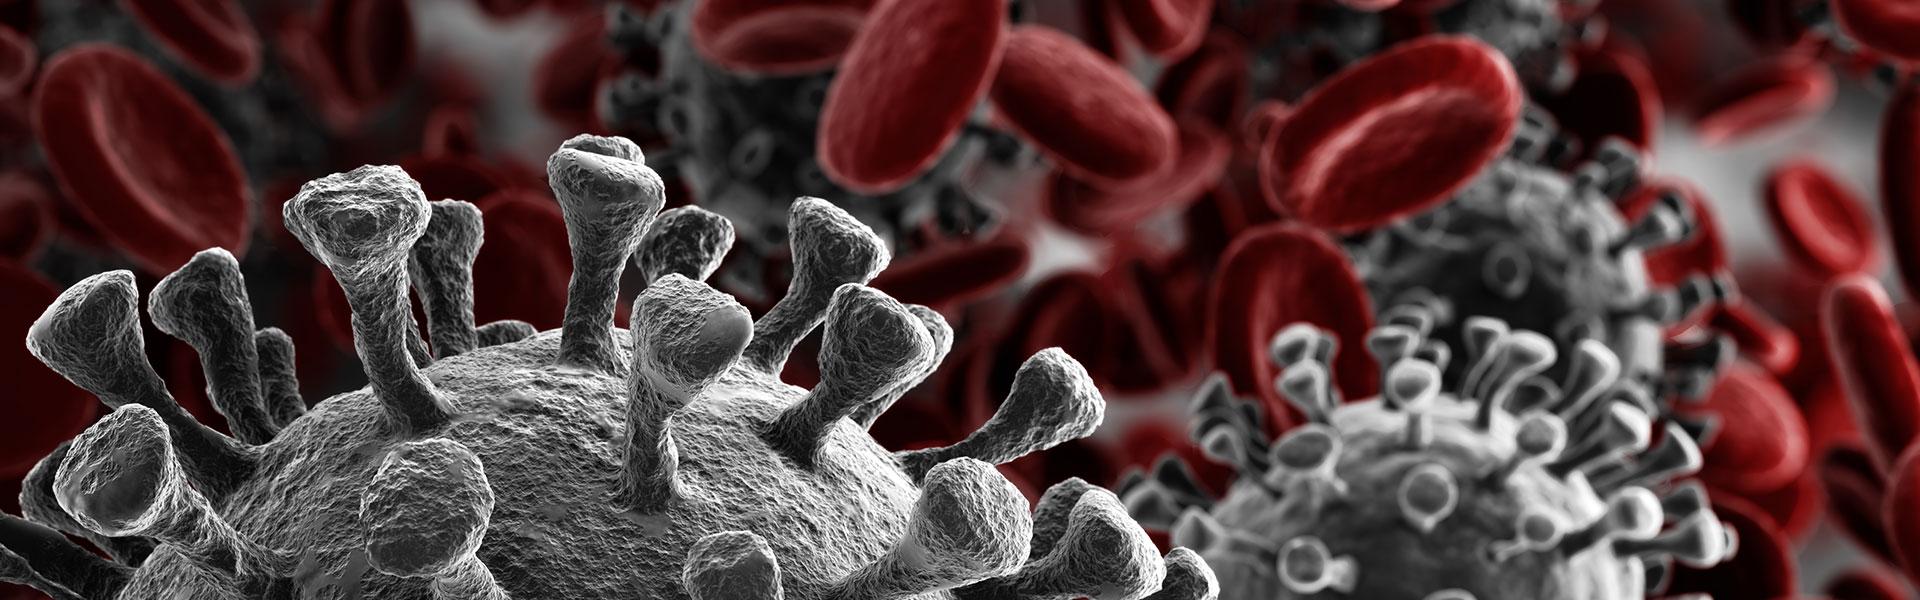 The Coronavirus is Disrupting Global Supply Chains